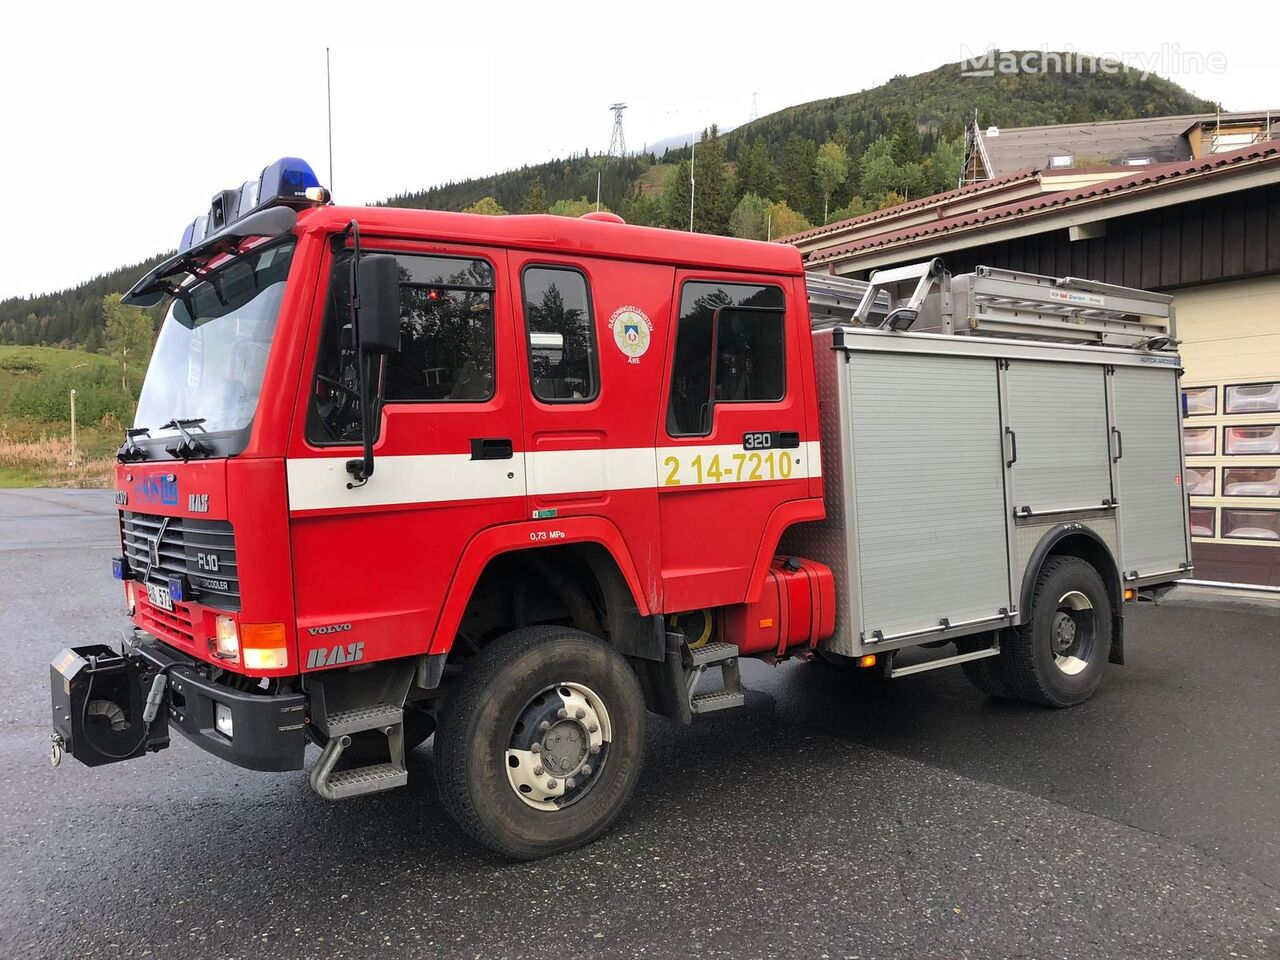 gasilsko vozilo VOLVO FL10 4x4, 1996 - fire engine släckbil autobomba